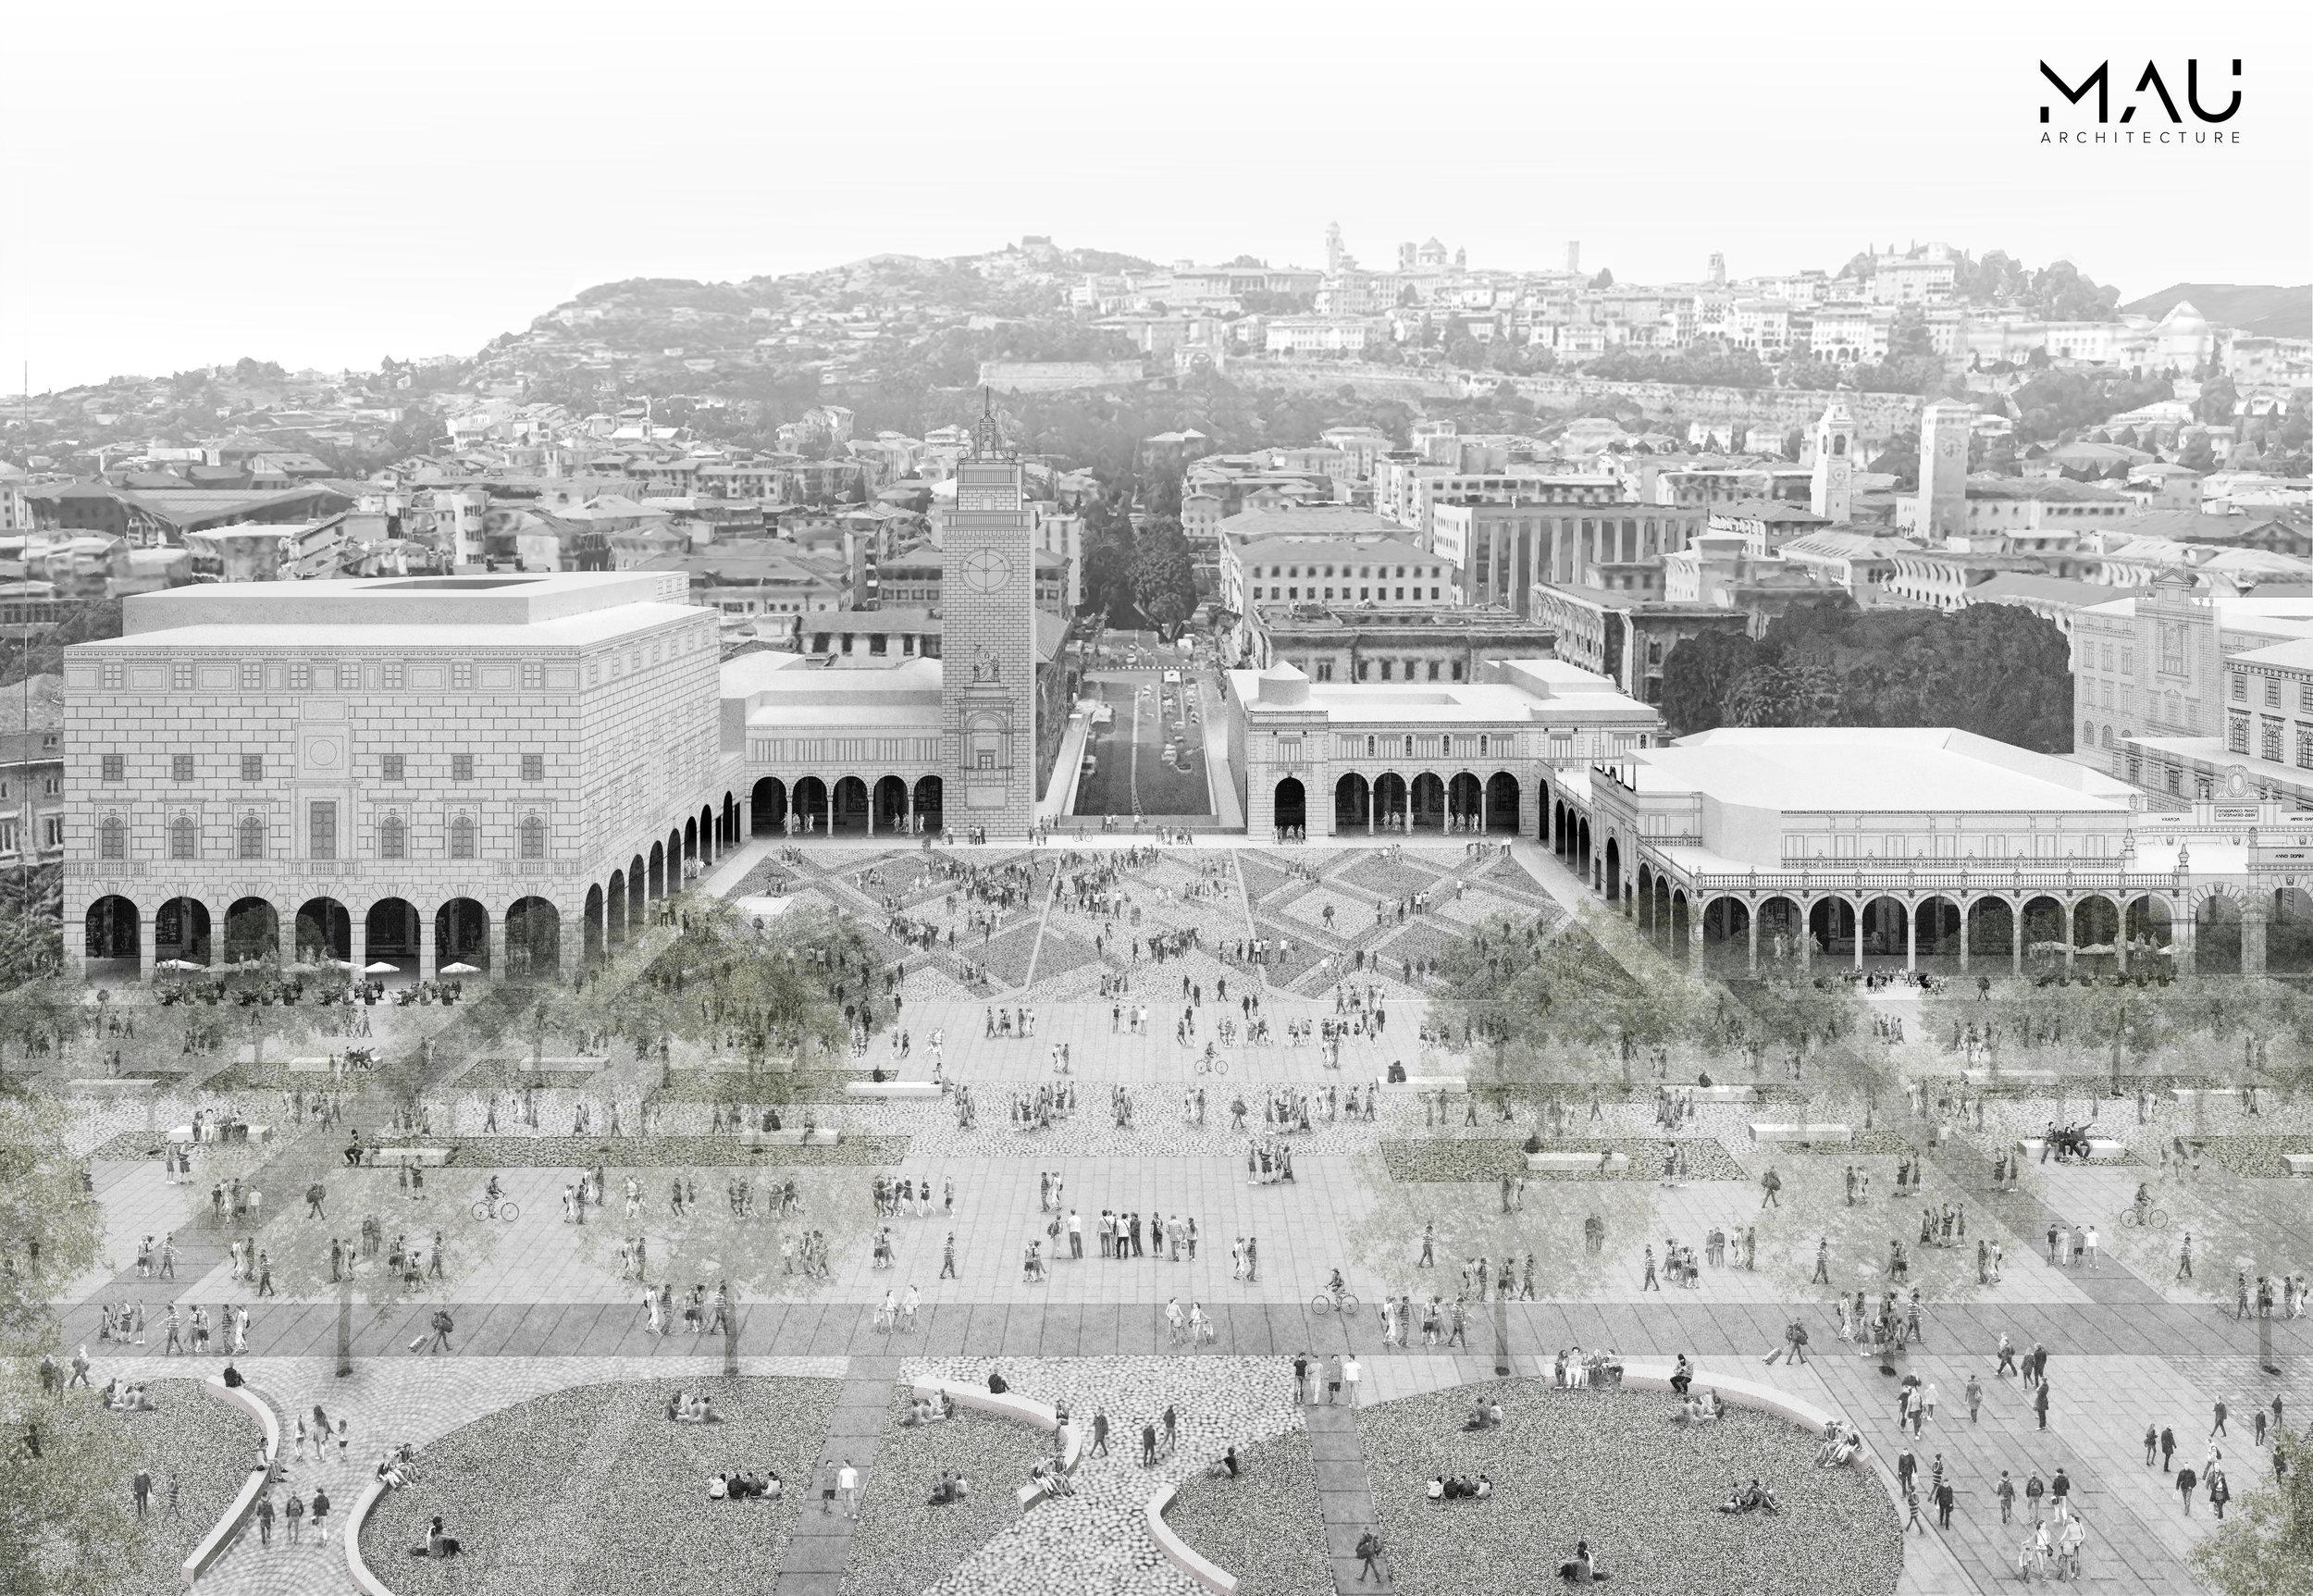 10 Vista Piazza Vittorio Veneto 1.jpg